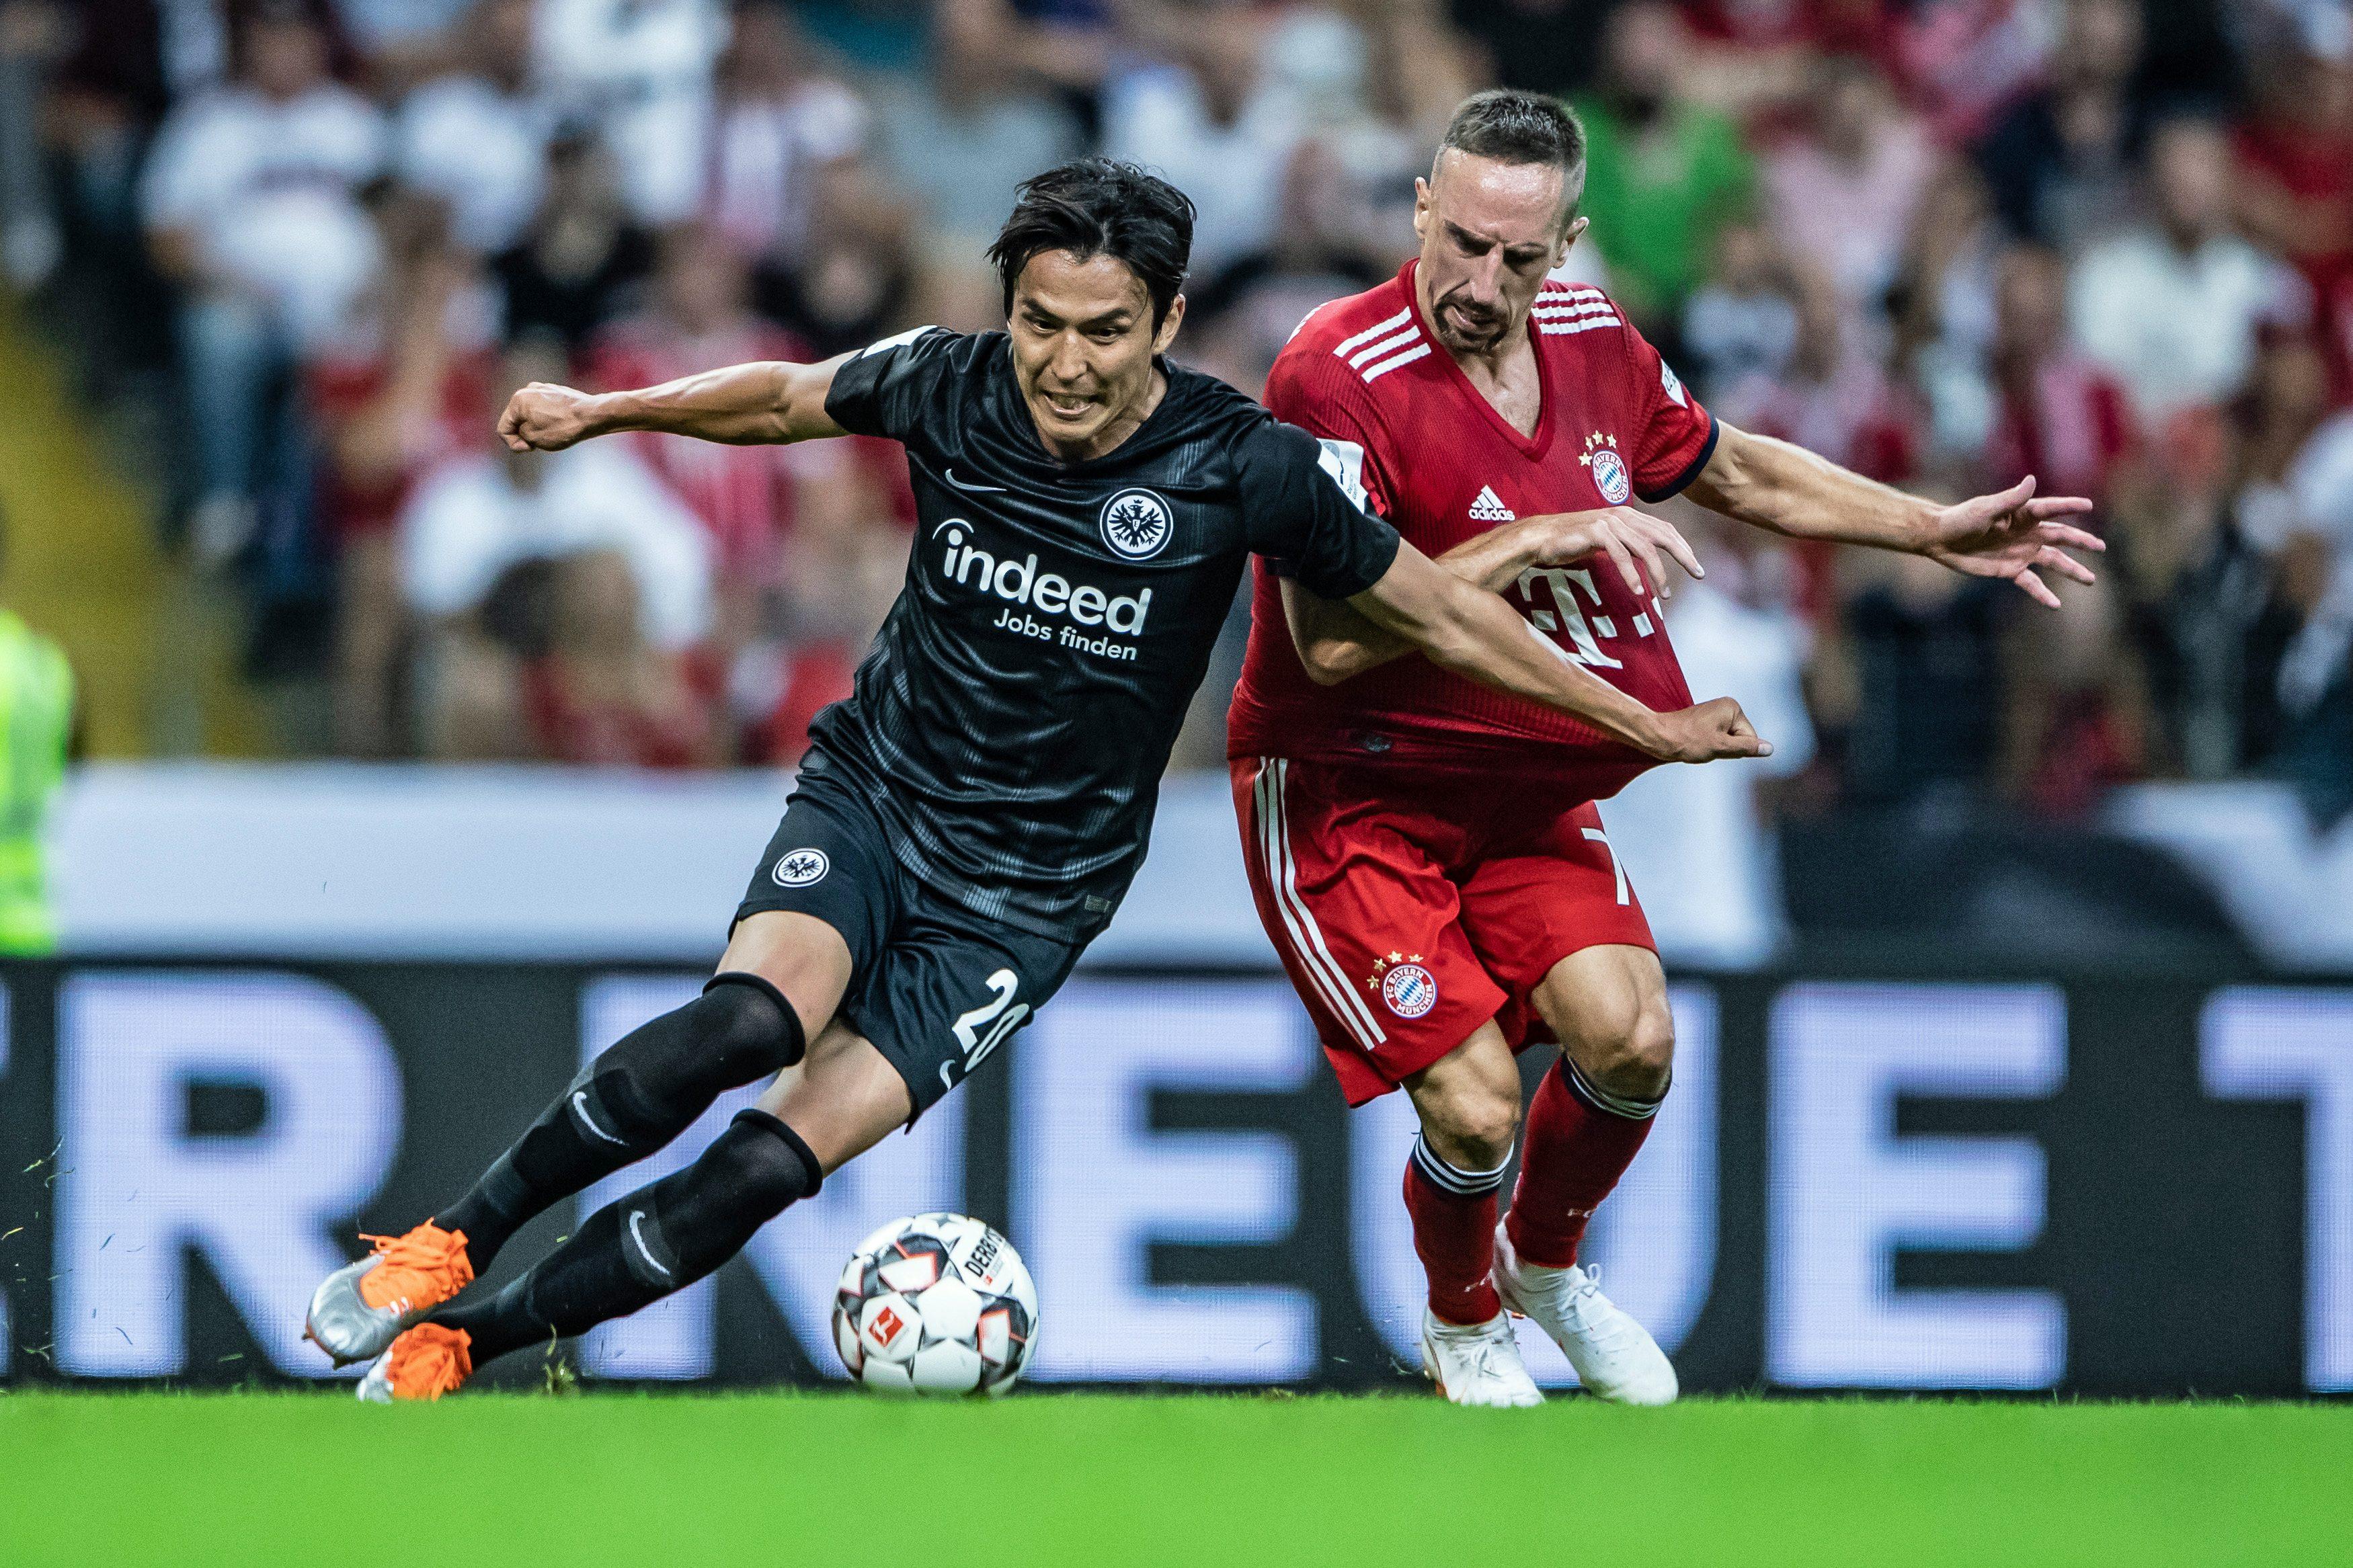 Bayern Munich vs Frankfurt: Phá bỏ lời nguyền